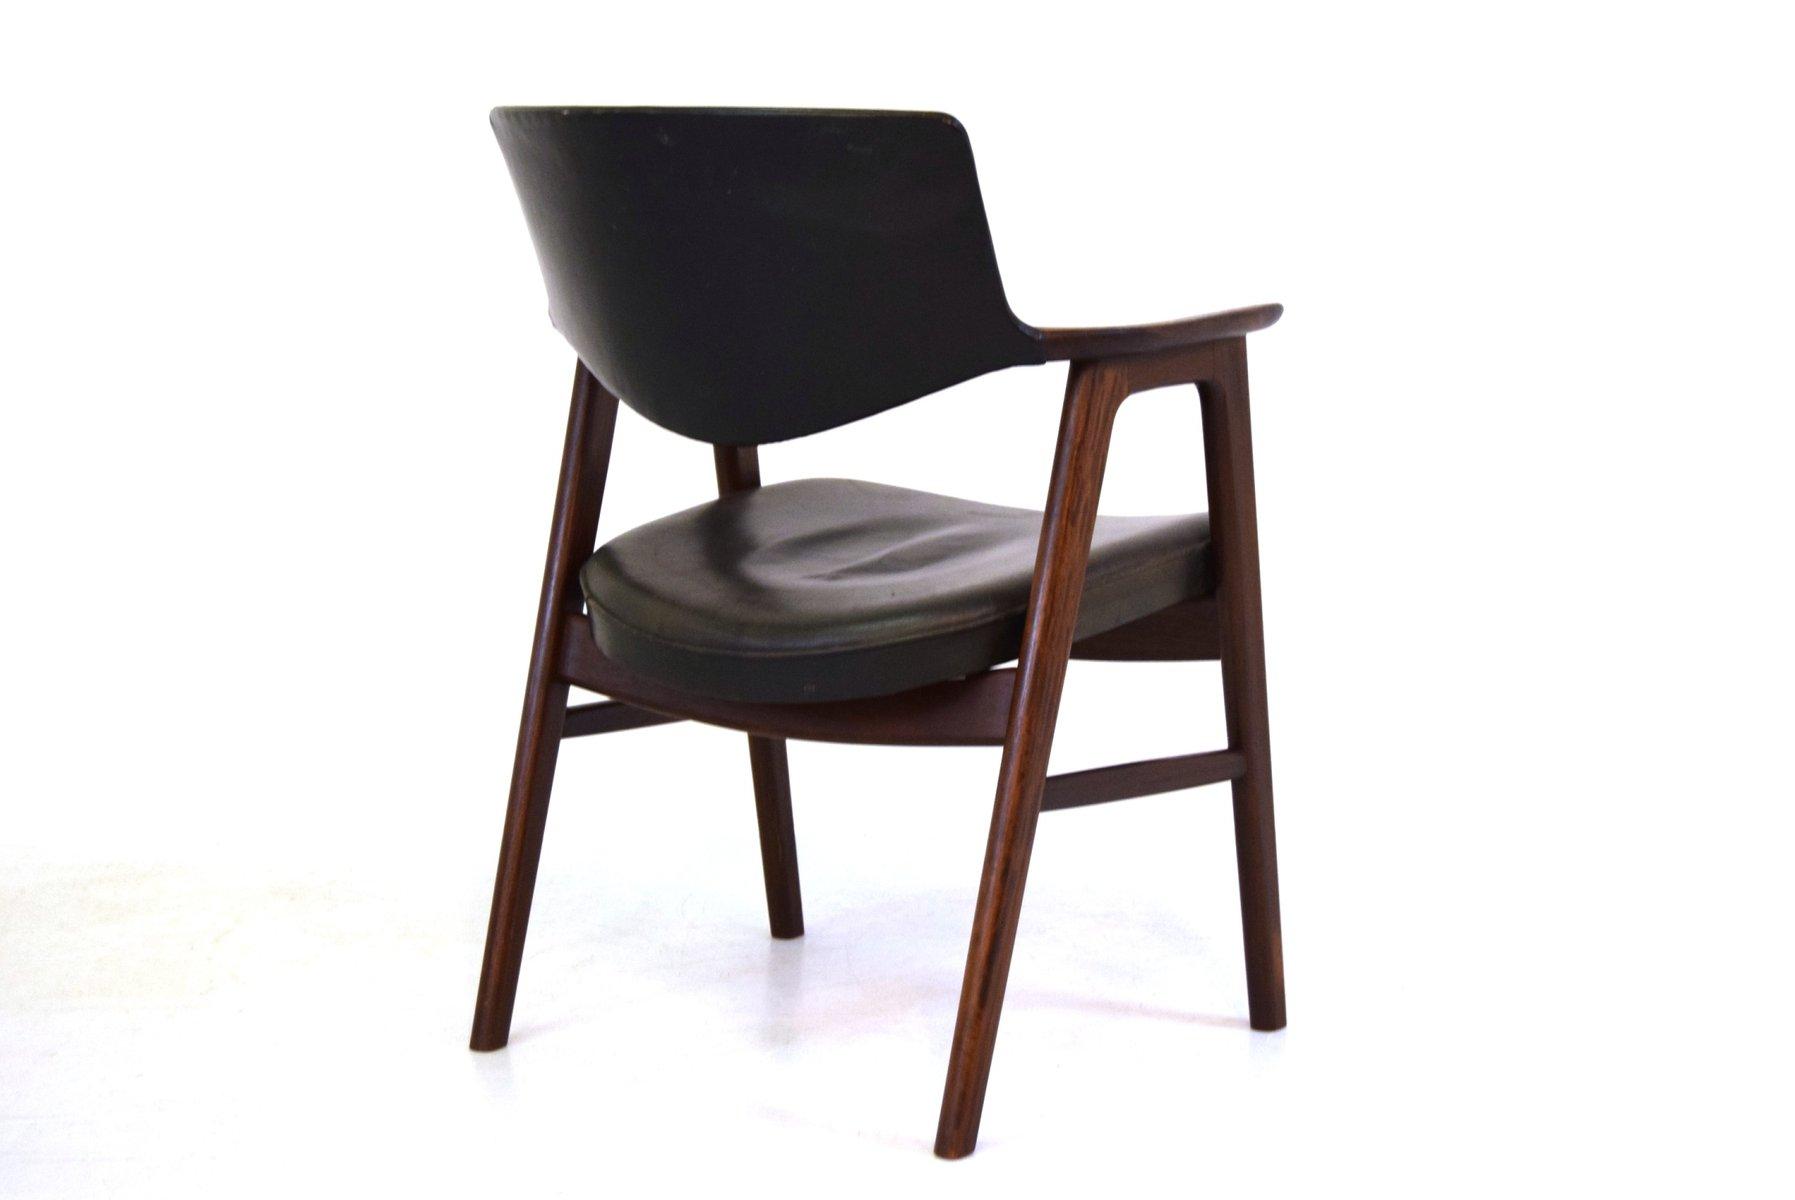 Danish Dining Chair by Erik Kierkegaard for H248ng  : danish dining chair by erik kierkegaard for hong stolefabrik 4 from www.pamono.com size 1795 x 1200 jpeg 56kB